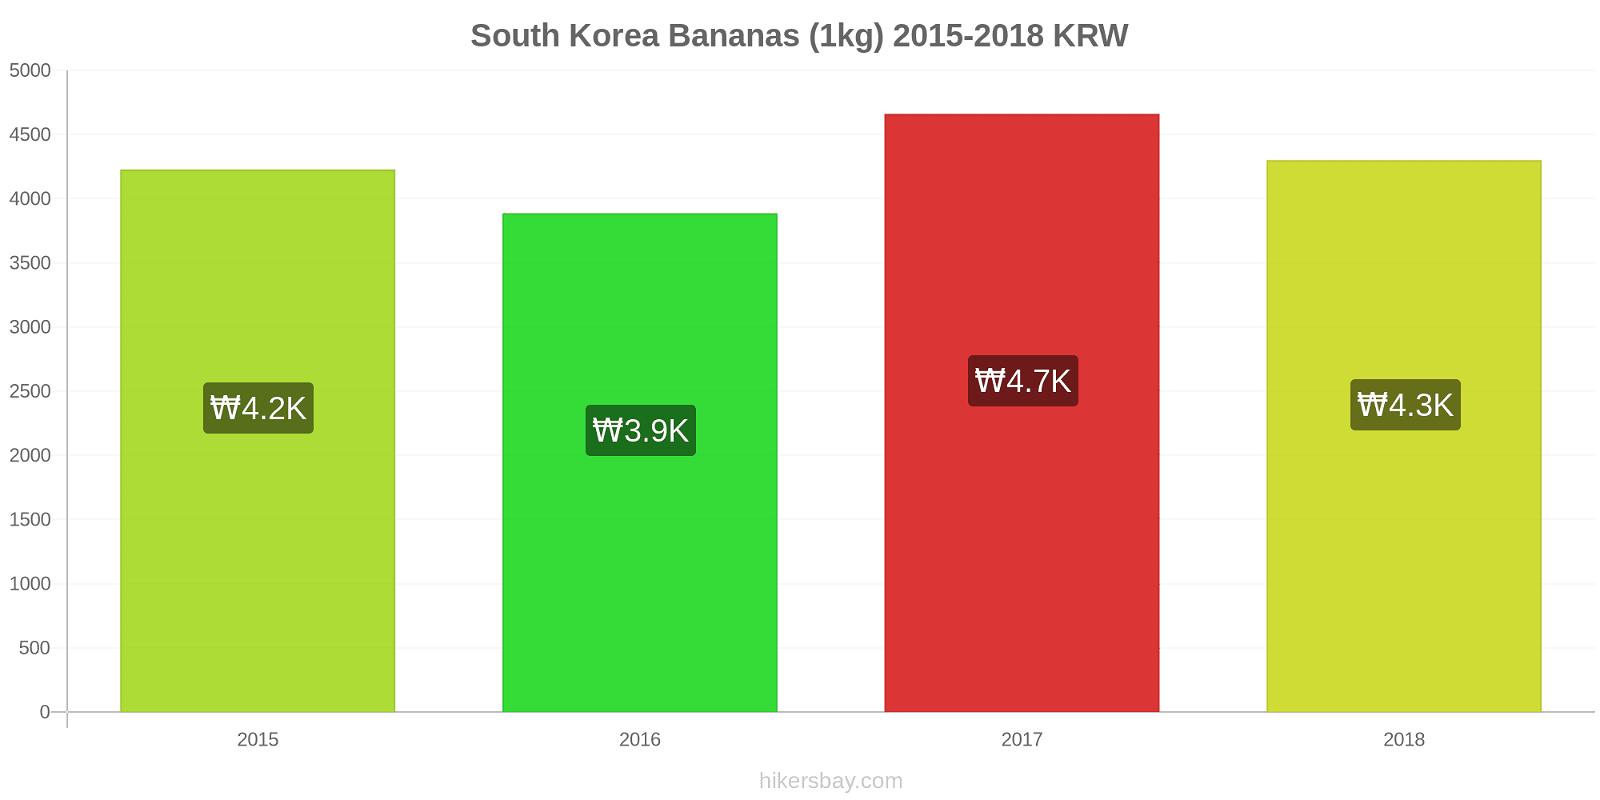 South Korea price changes Bananas (1kg) hikersbay.com